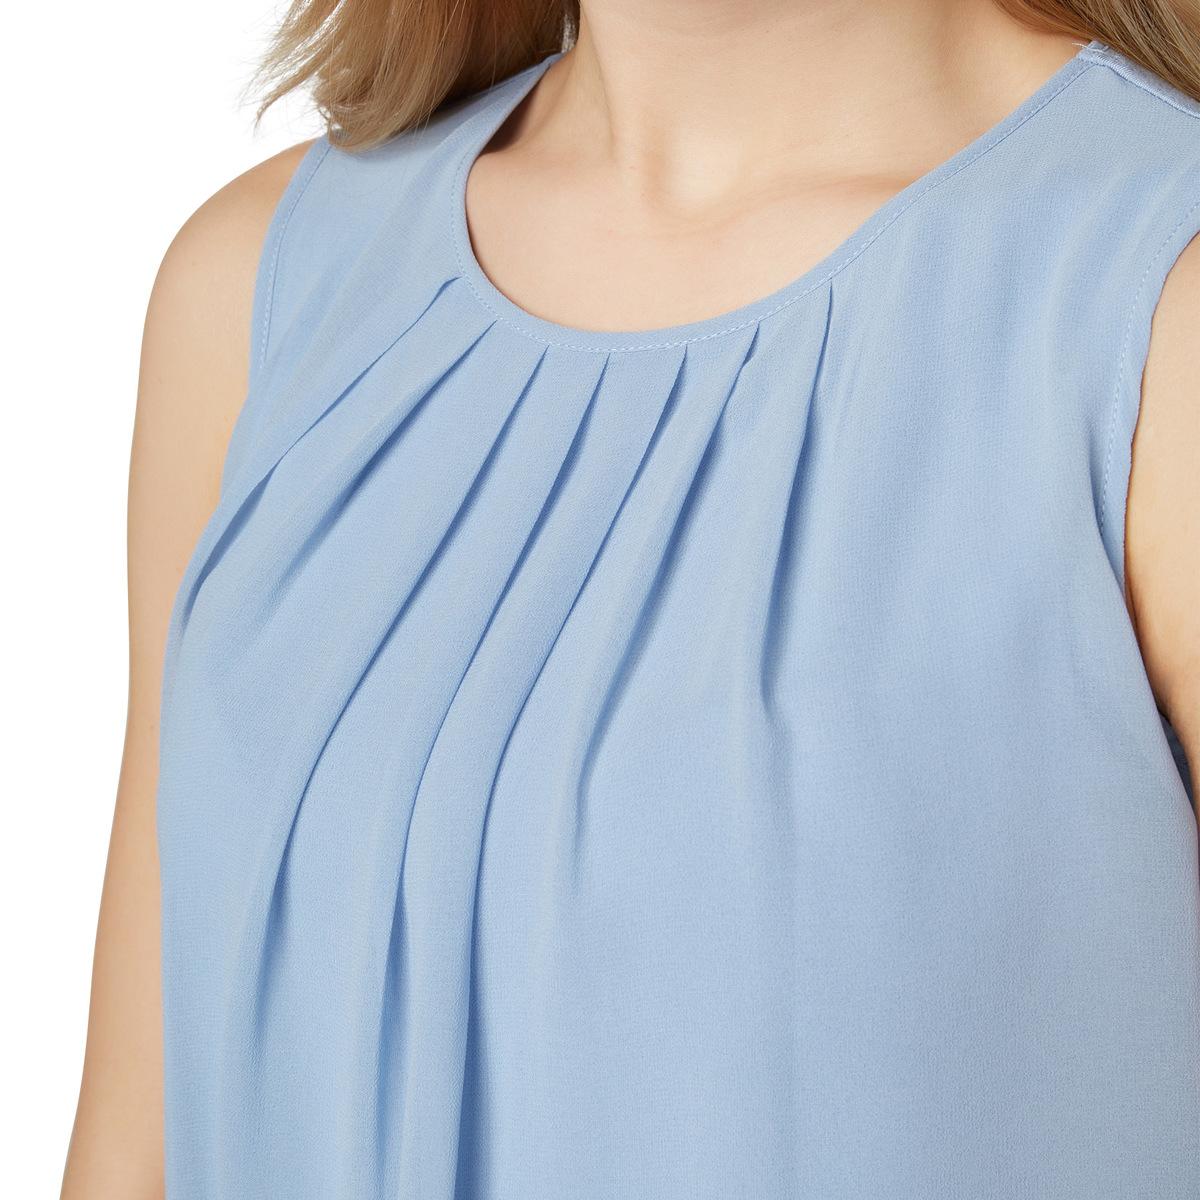 Top aus eleganter Crêpe-Qualität in lily blue